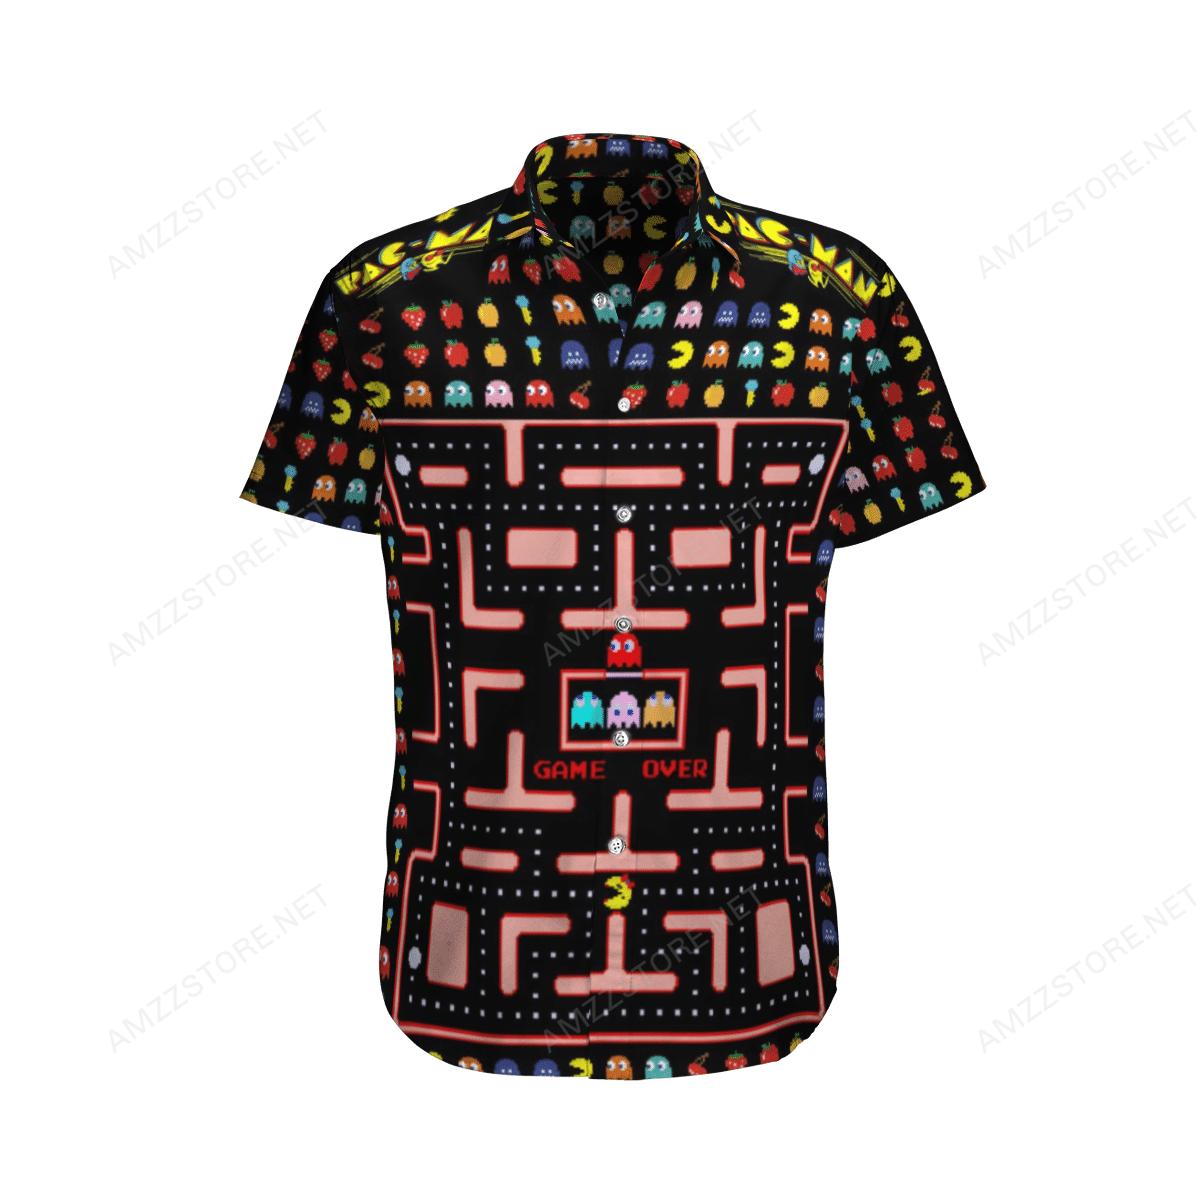 Pac-man Game Over Hawaiian Shirt